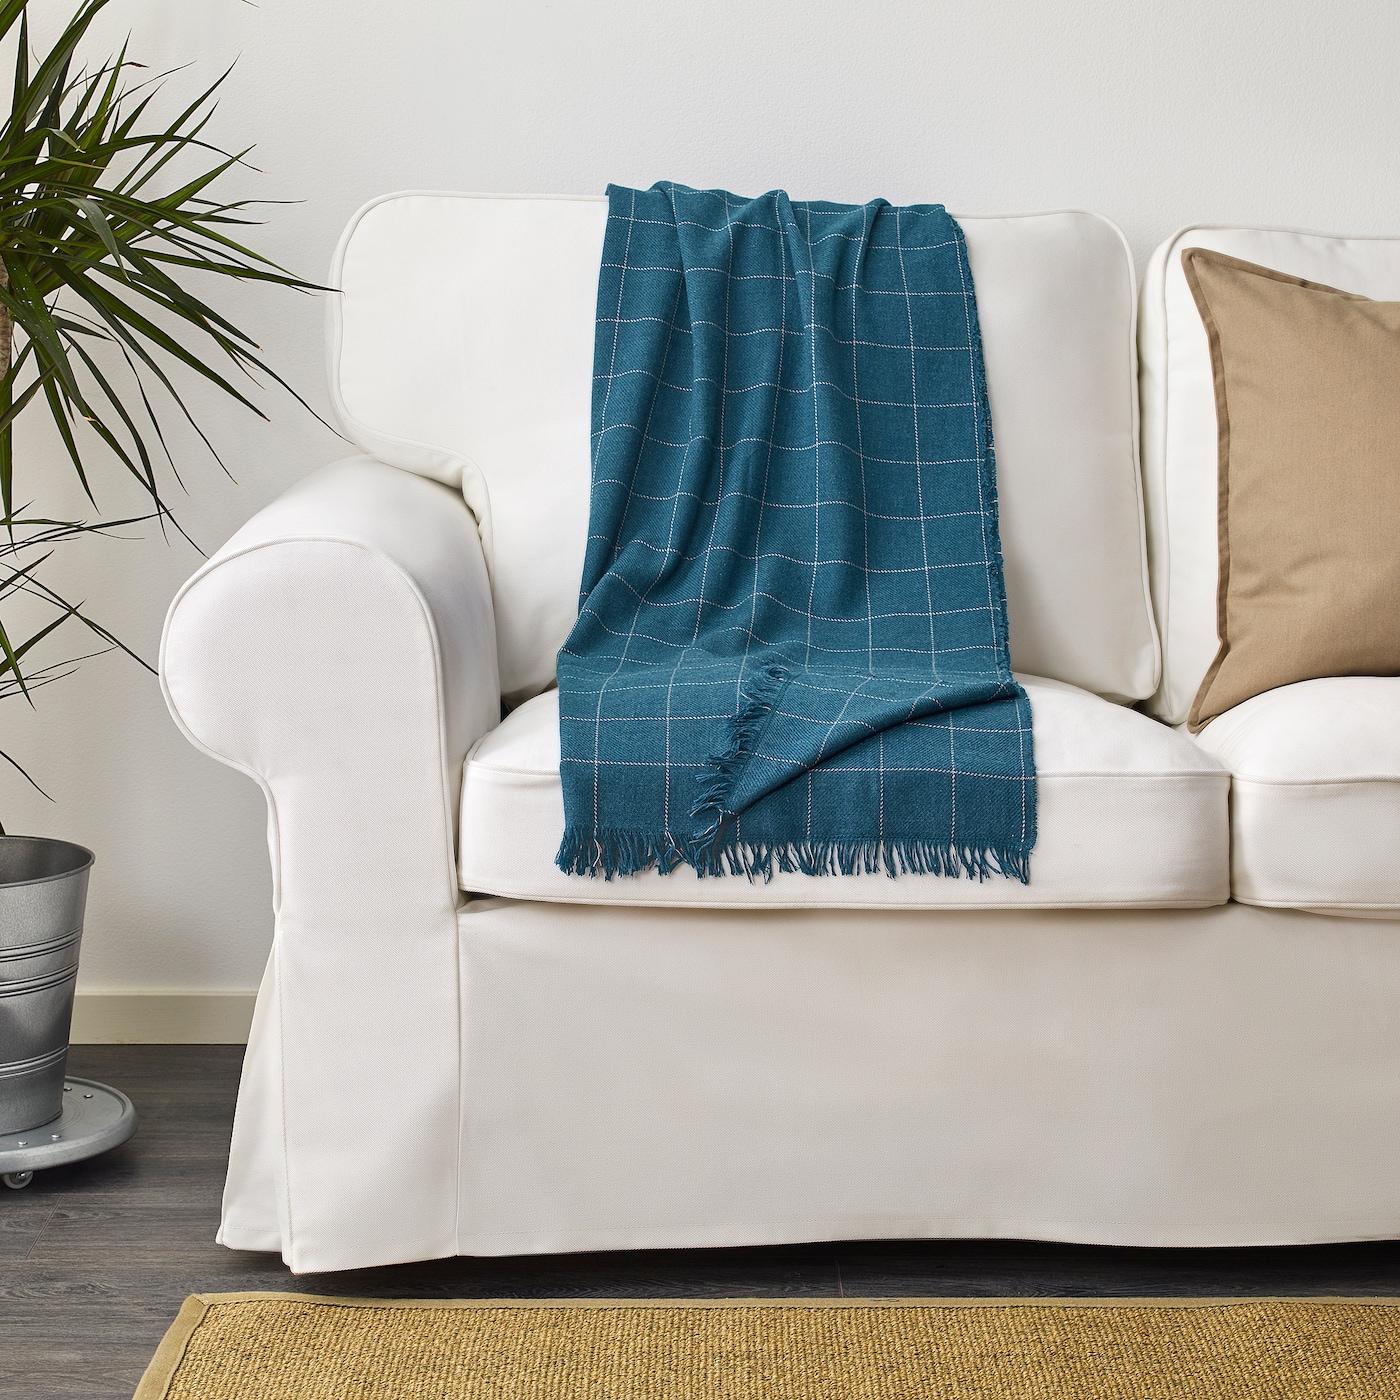 Plaid couverture couverture couverture de jour 110x170cm IKEA varkrage Plaid en bleu;